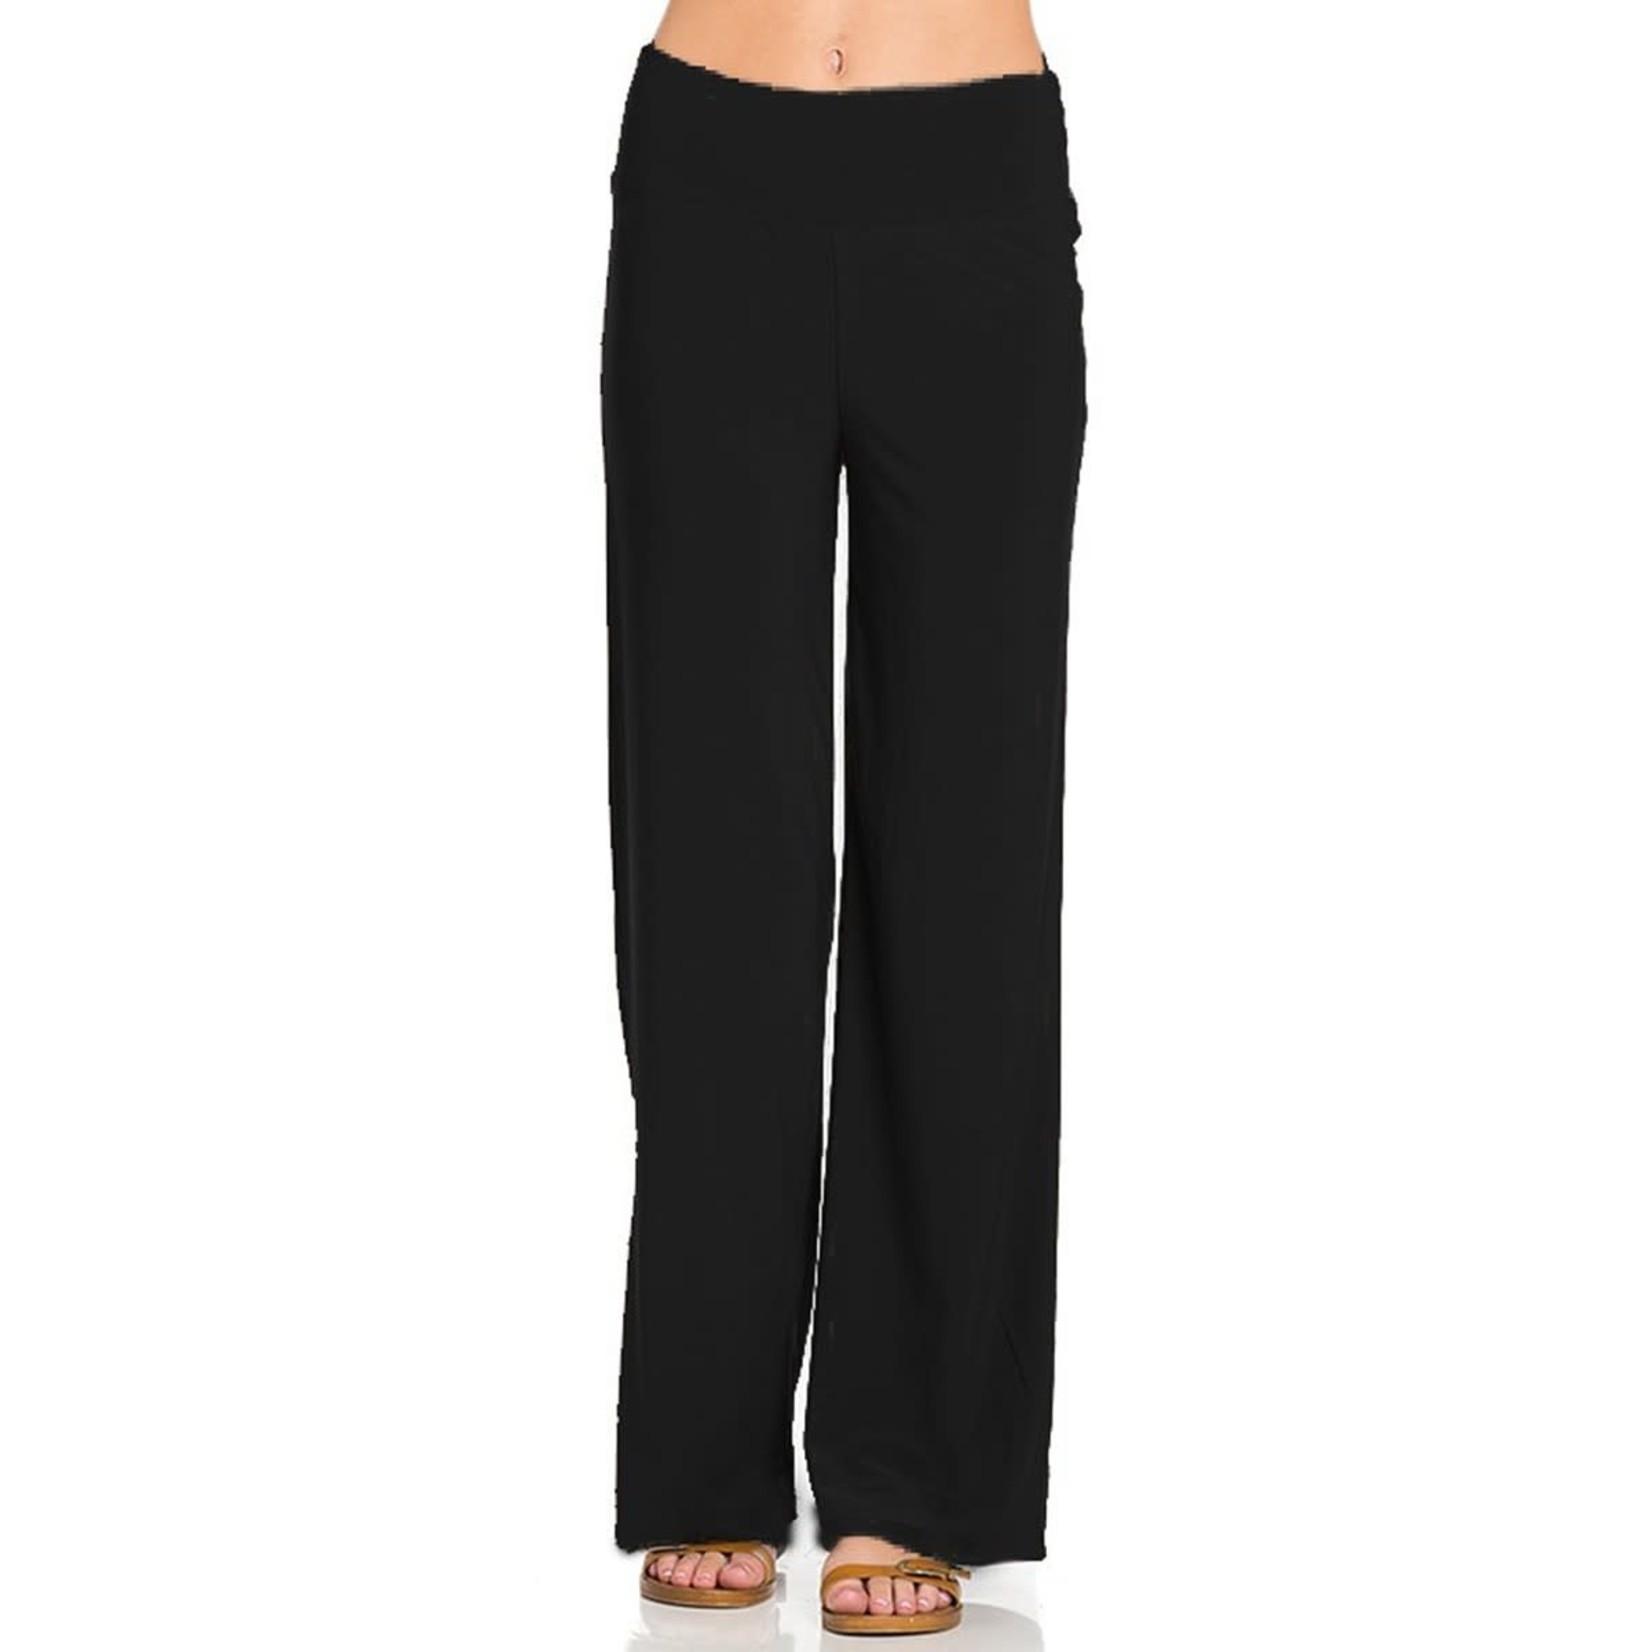 Azules Bottoms: Wide Legged Pants